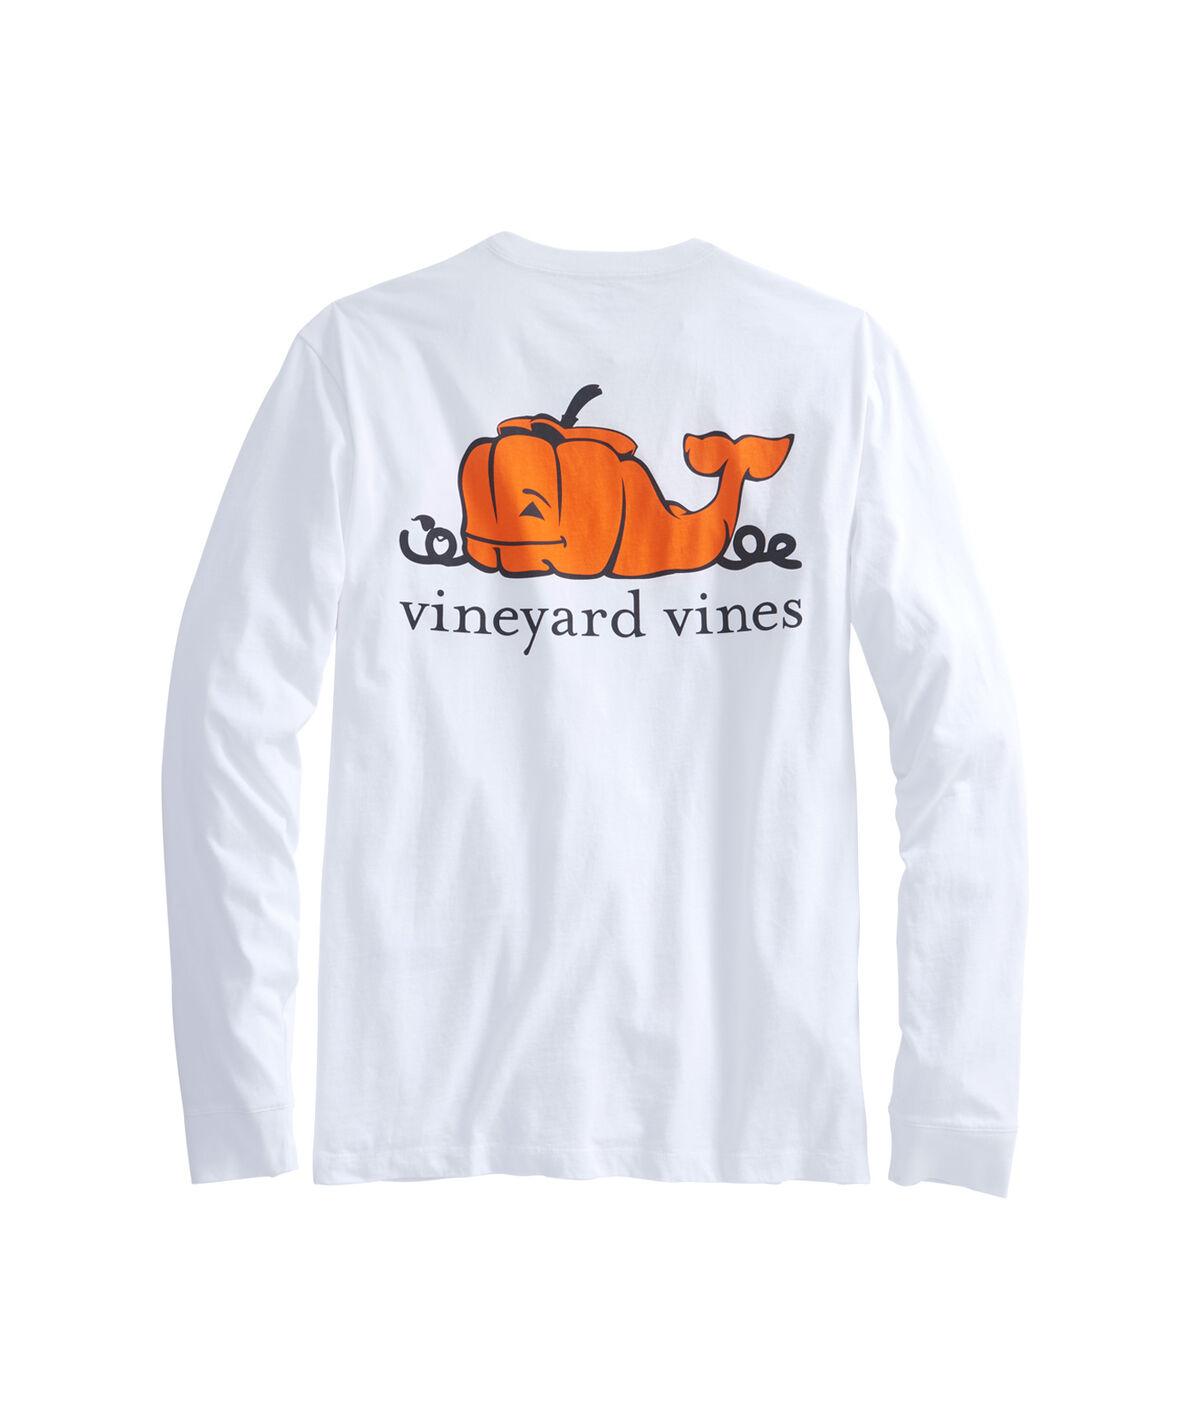 Vineyard Vines Long Sleeve Shirts On Sale Kamos T Shirt